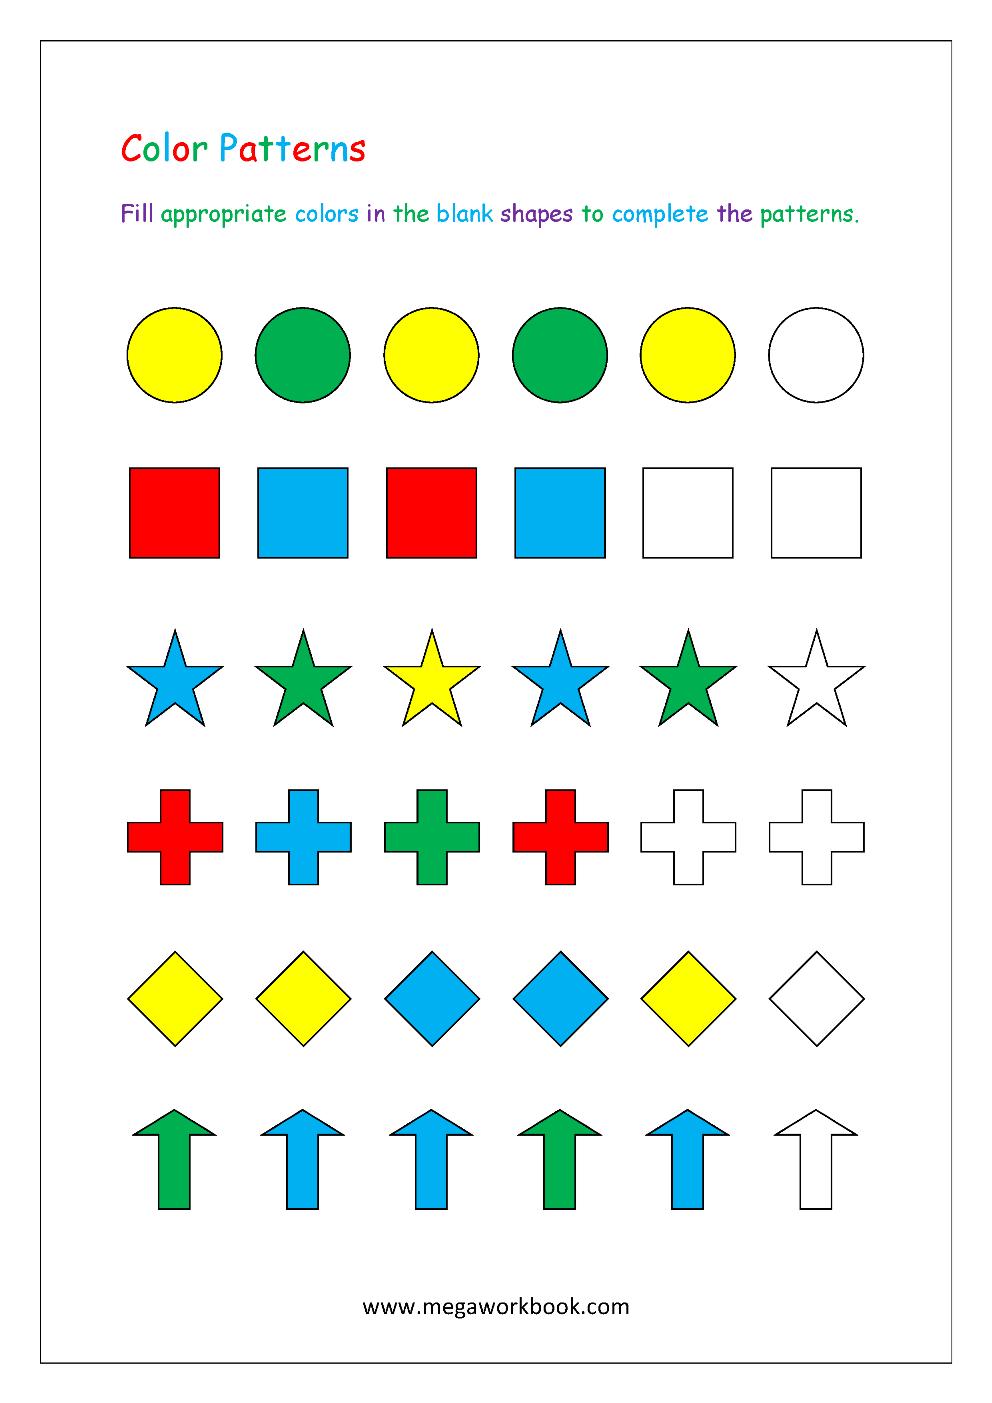 Color Pattern Worksheet Repeating Patterns Mathclassroomdecorations Egitim Okul Okuma